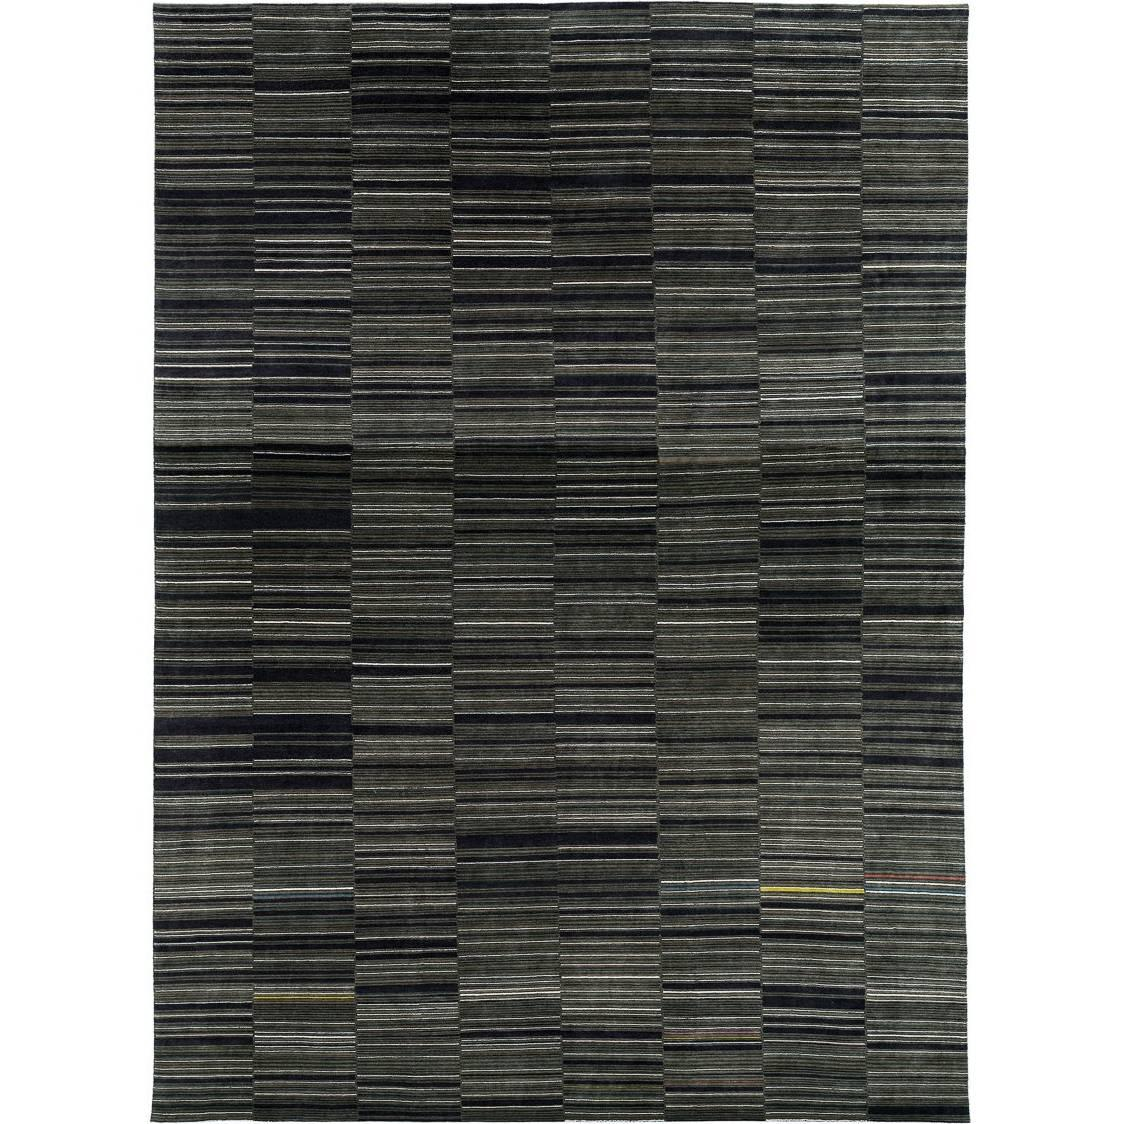 Modern Multicolored Area Rug by Carini